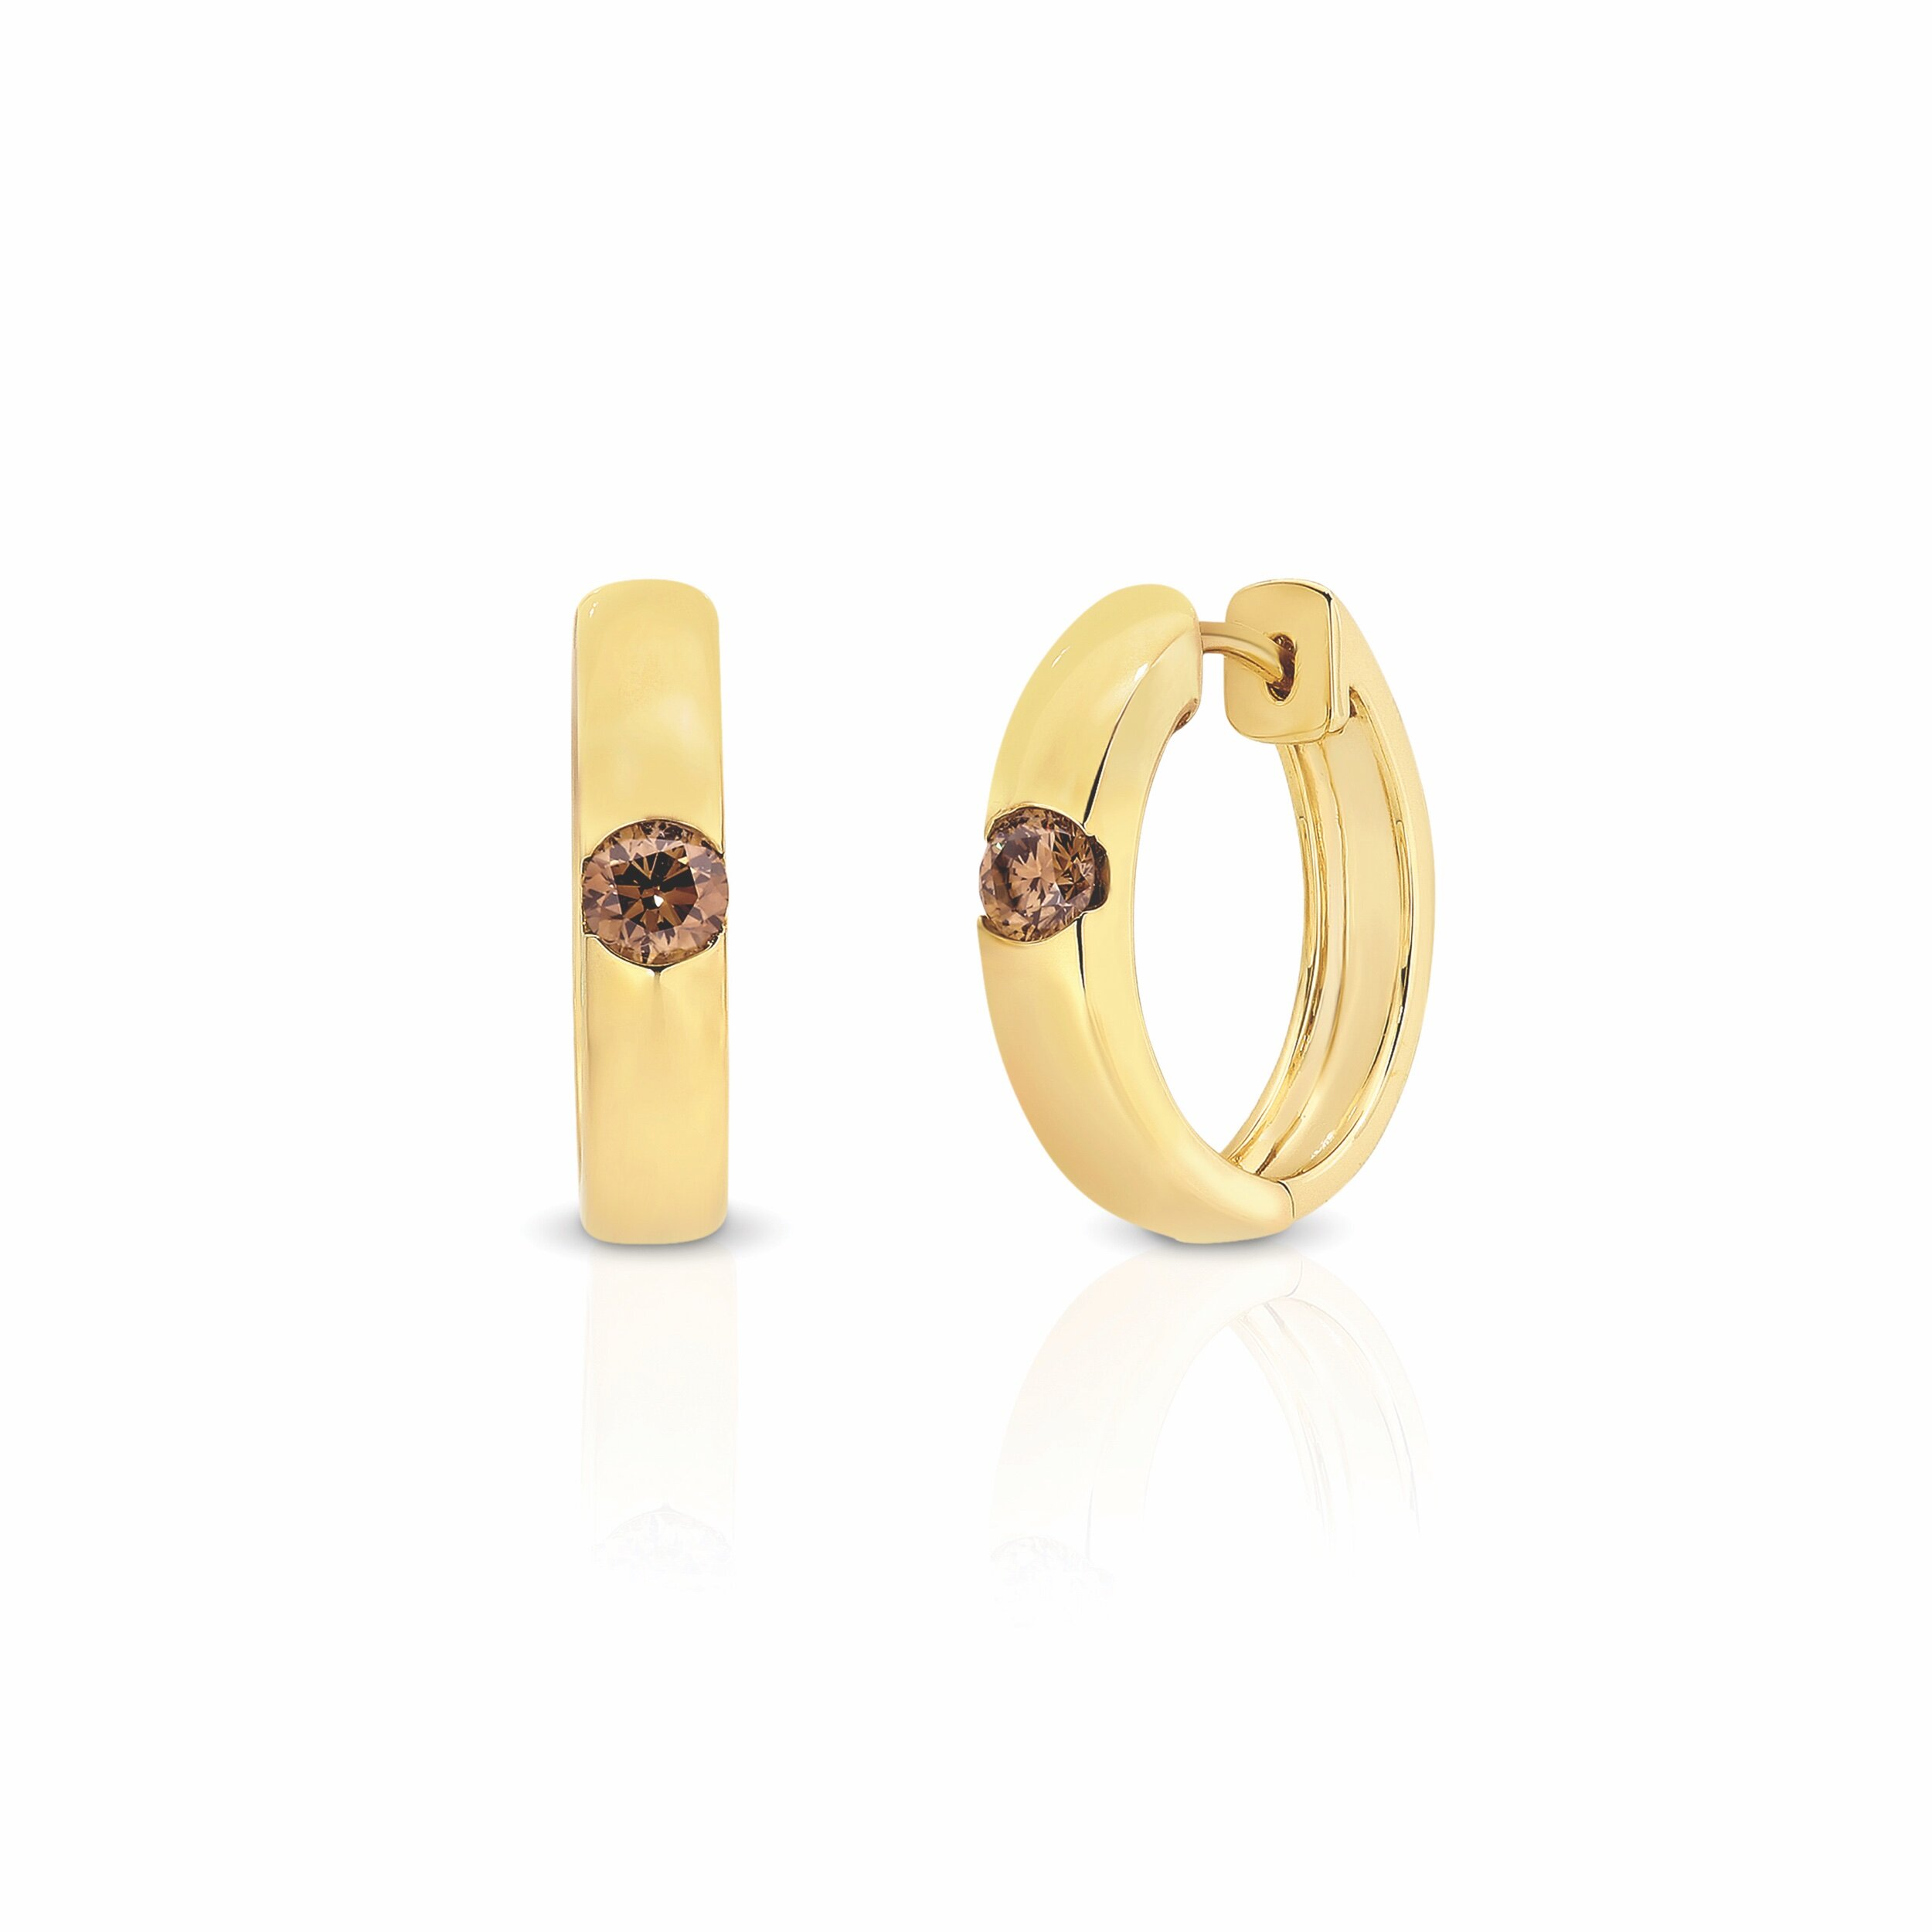 6023 970351023-earring.jpeg